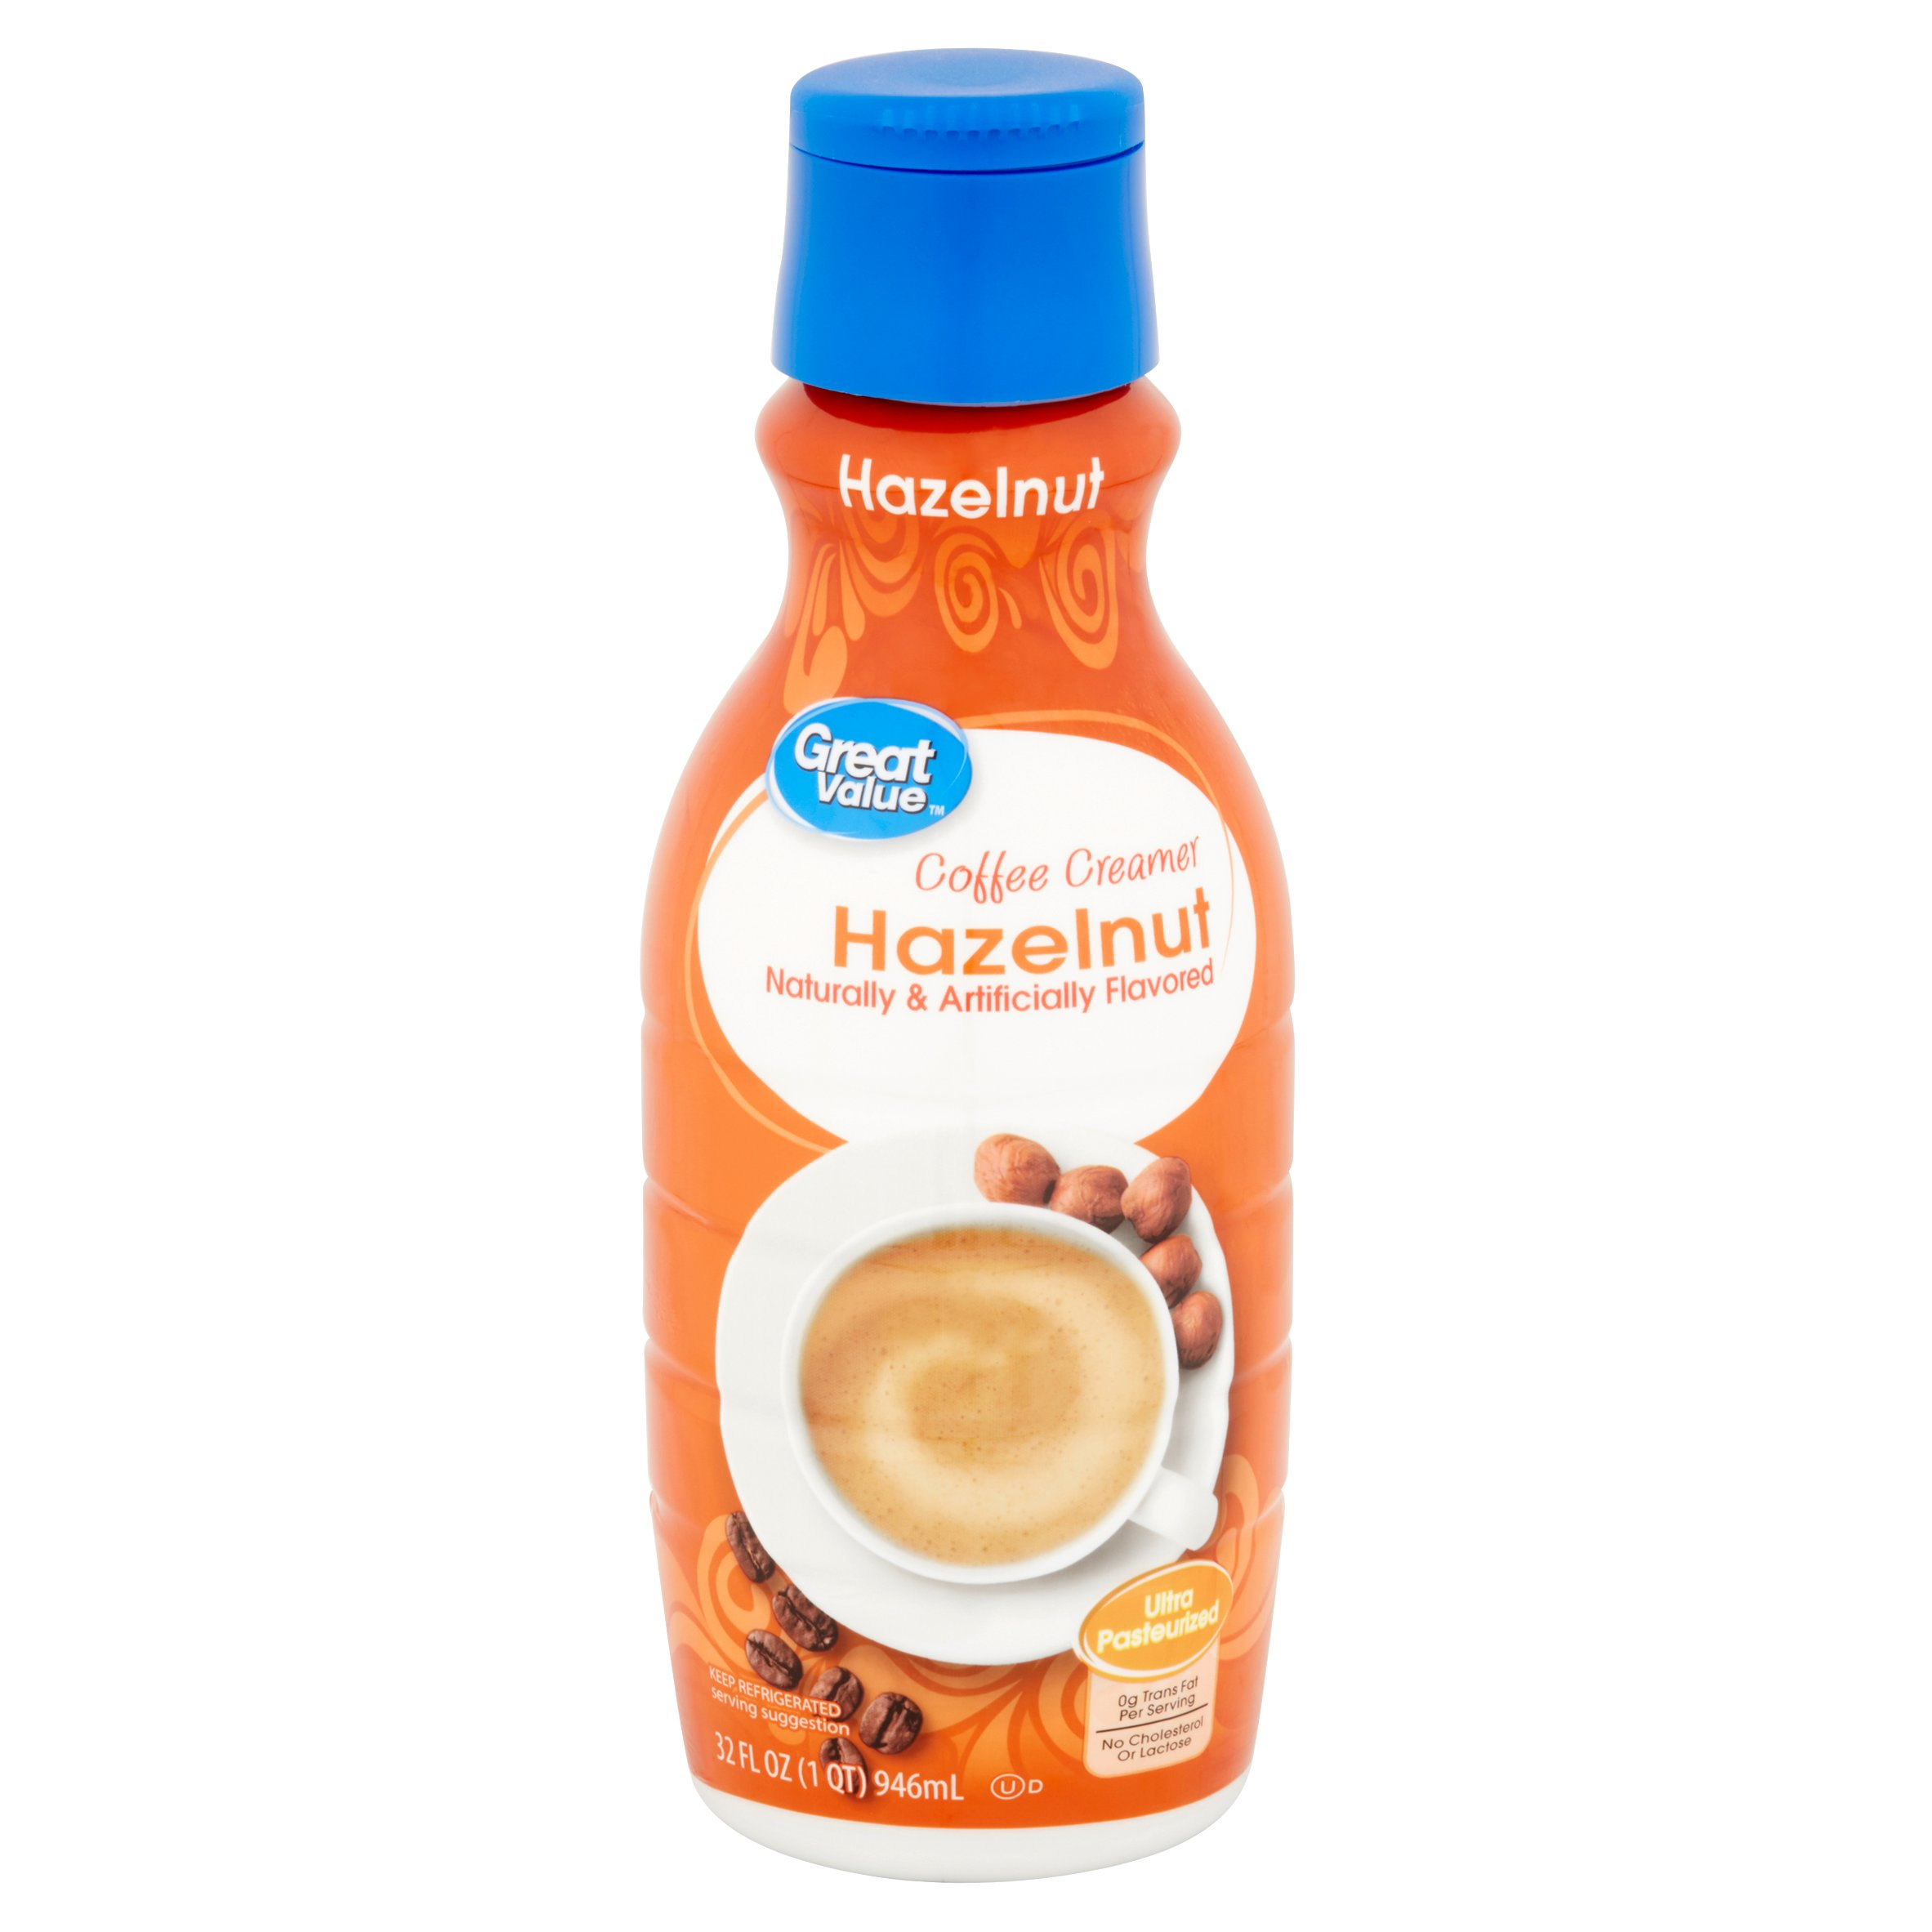 Great Value Coffee Creamer, Hazelnut, 32 Fl Oz   Walmart.com